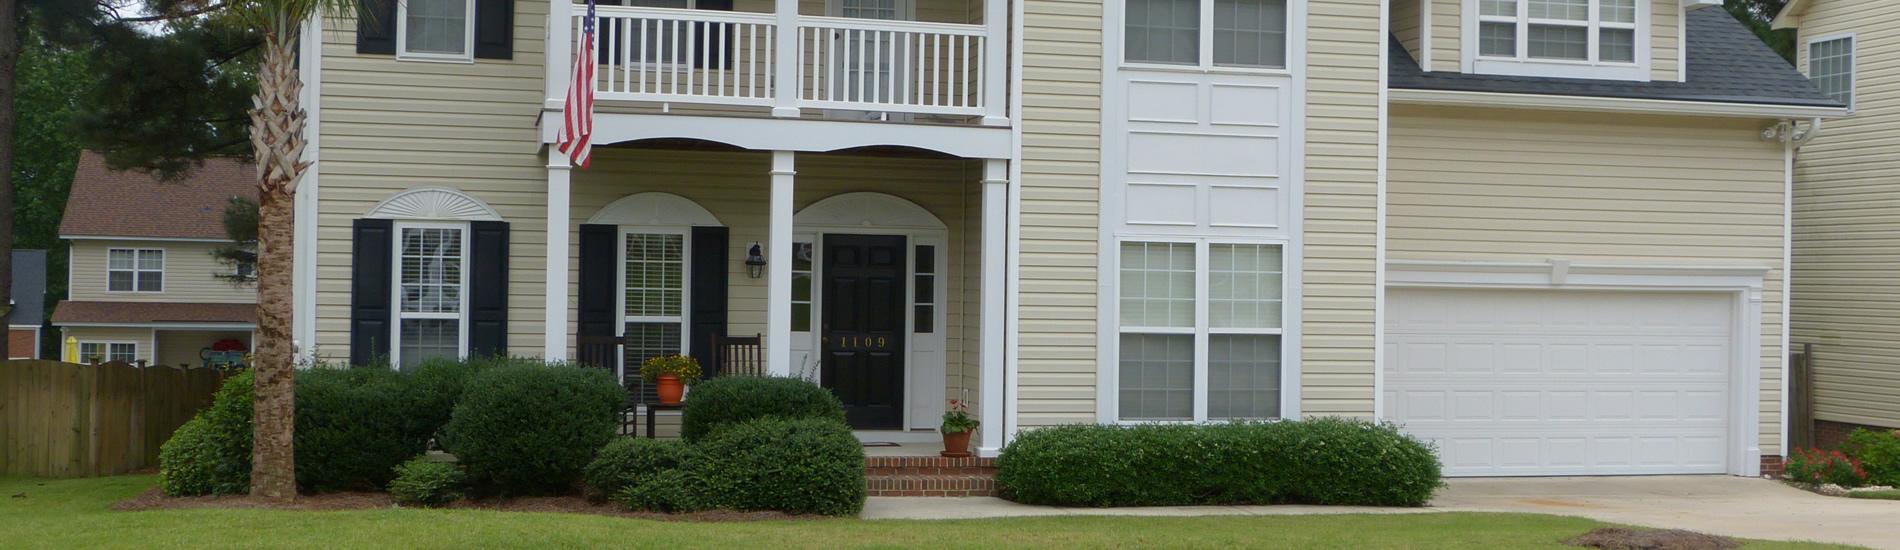 Homes for Sale in Walden Place - Elgin Real Estate